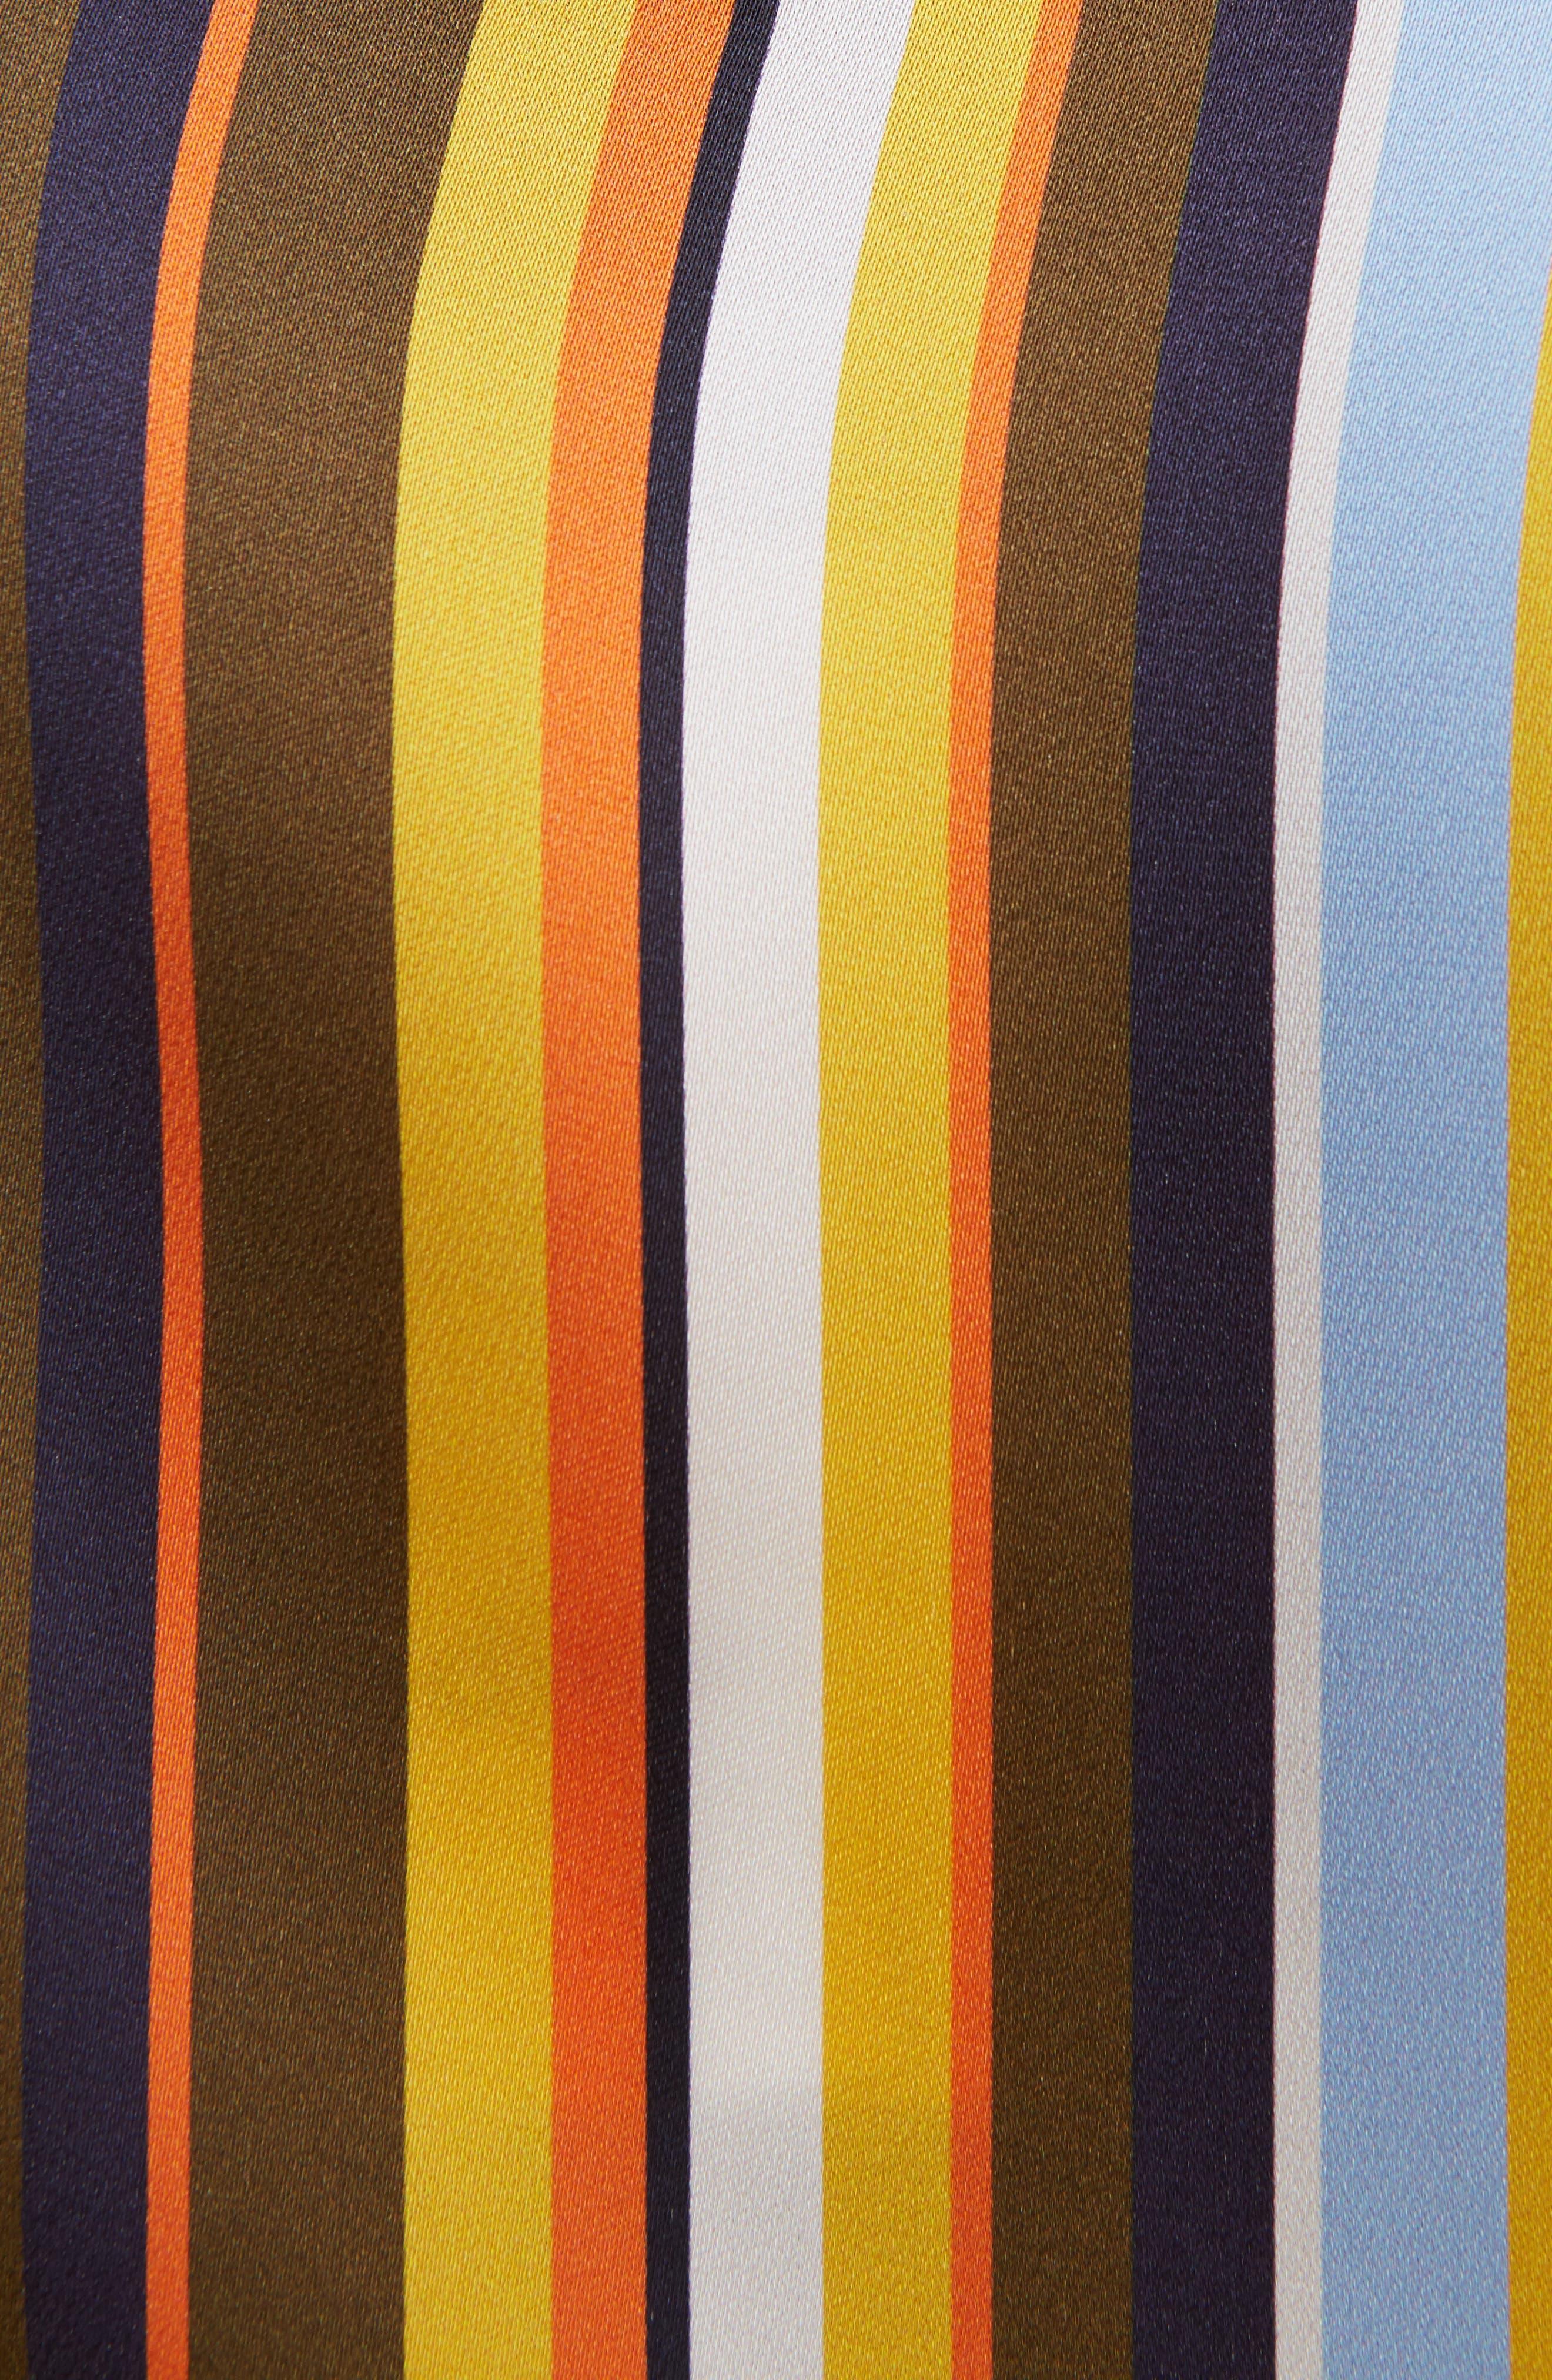 Buse Multistripe Blouse,                             Alternate thumbnail 3, color,                             Multi Stripe Brown